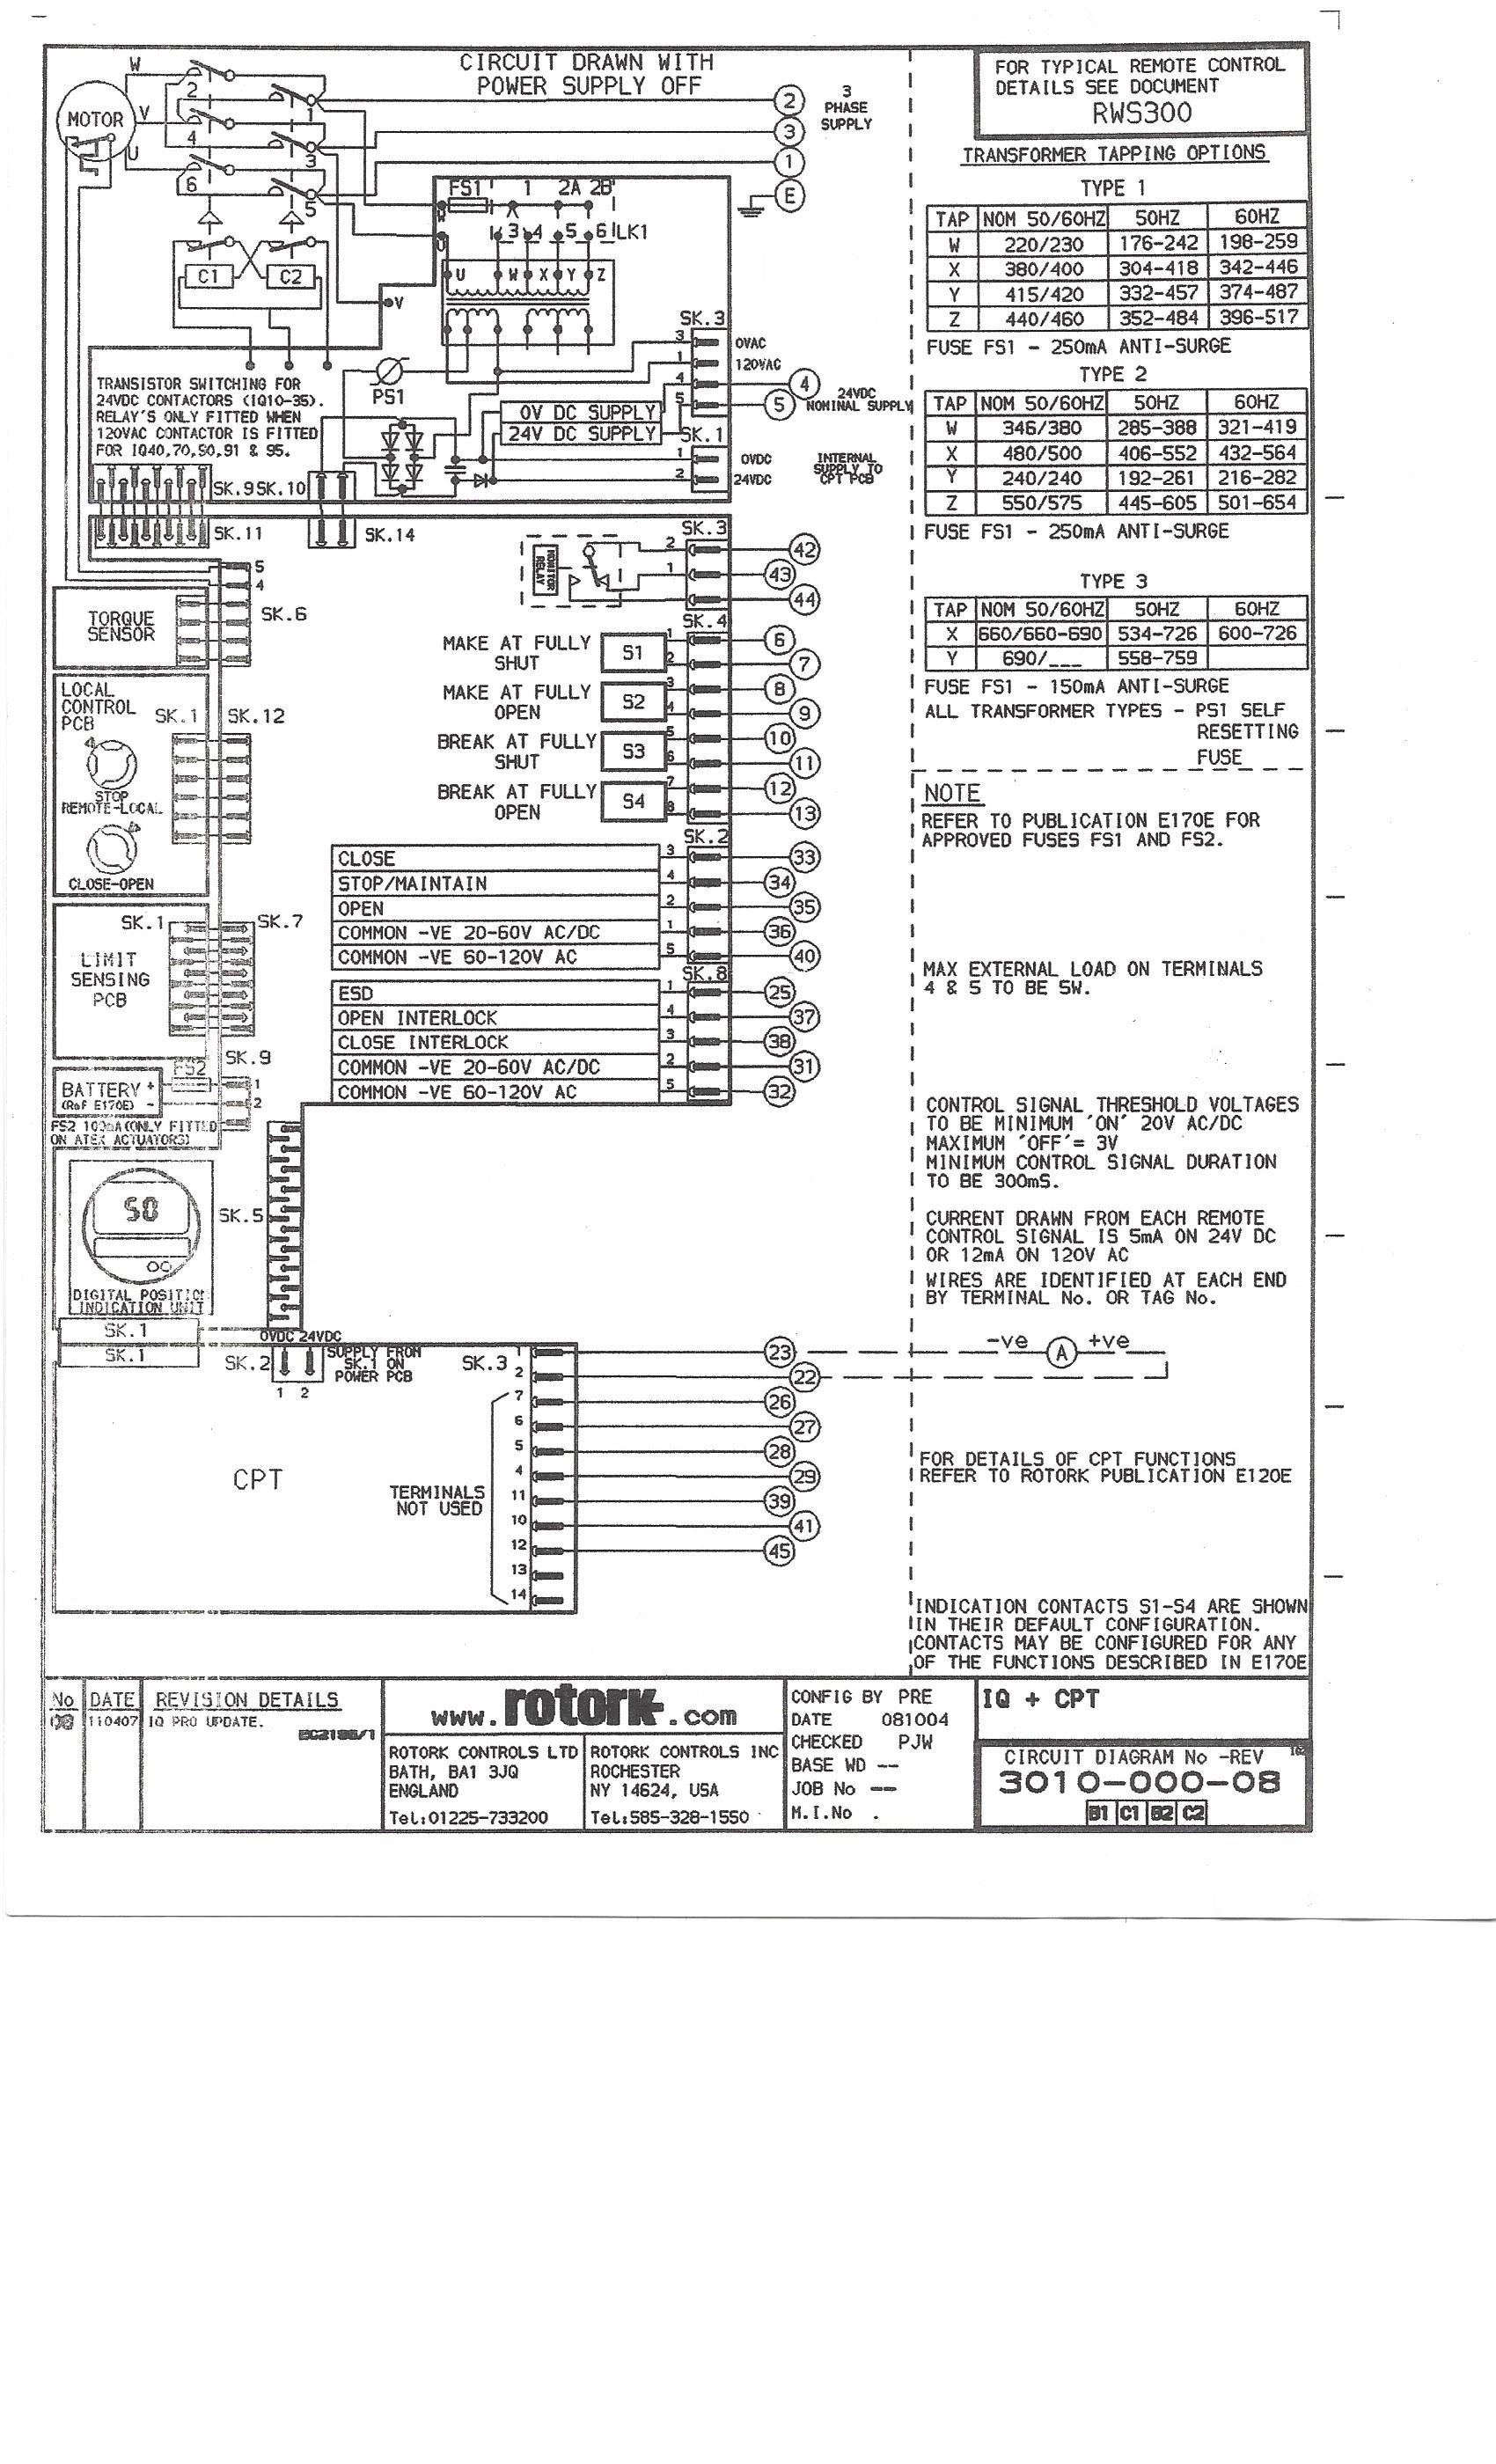 Charming Auma Actuators Wiring Diagram Photos Electrical Circuit Rotork Wiring Diagram PDF Limitorque Wiring Diagrams Rotork Mov Manual Pdf At IT-Energia.com